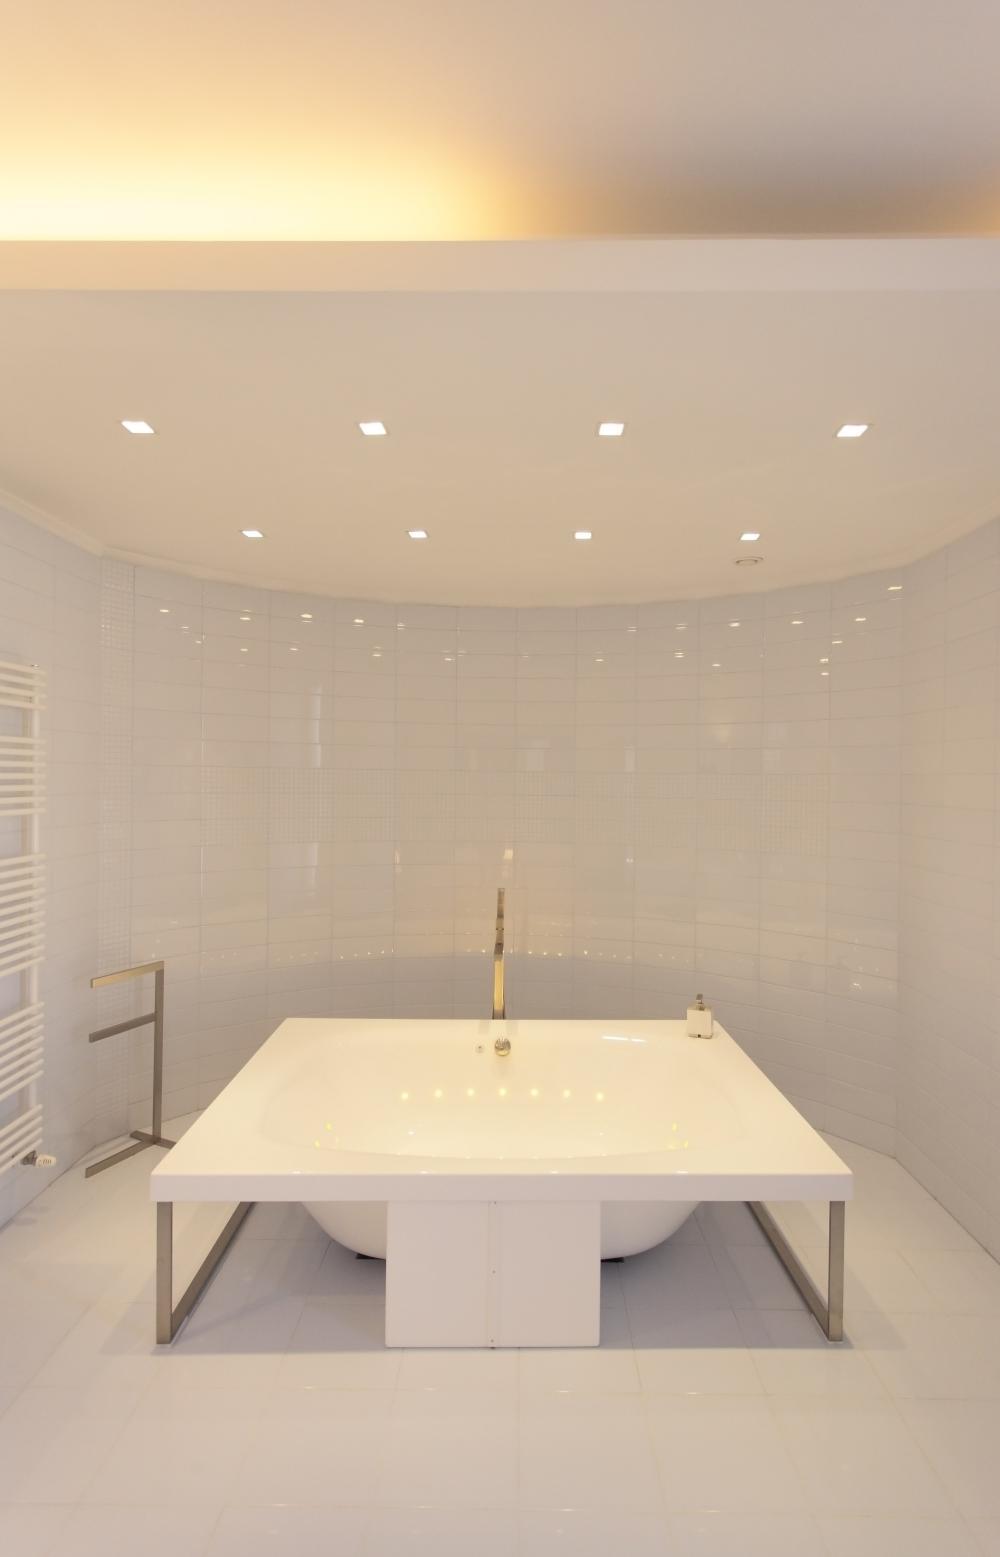 https://nbc-arhitect.ro/wp-content/uploads/2020/10/NBC-Arhitect-_-Cube-House-_-Bucharest-Romania-_-interior-view-bathroom_12.jpg